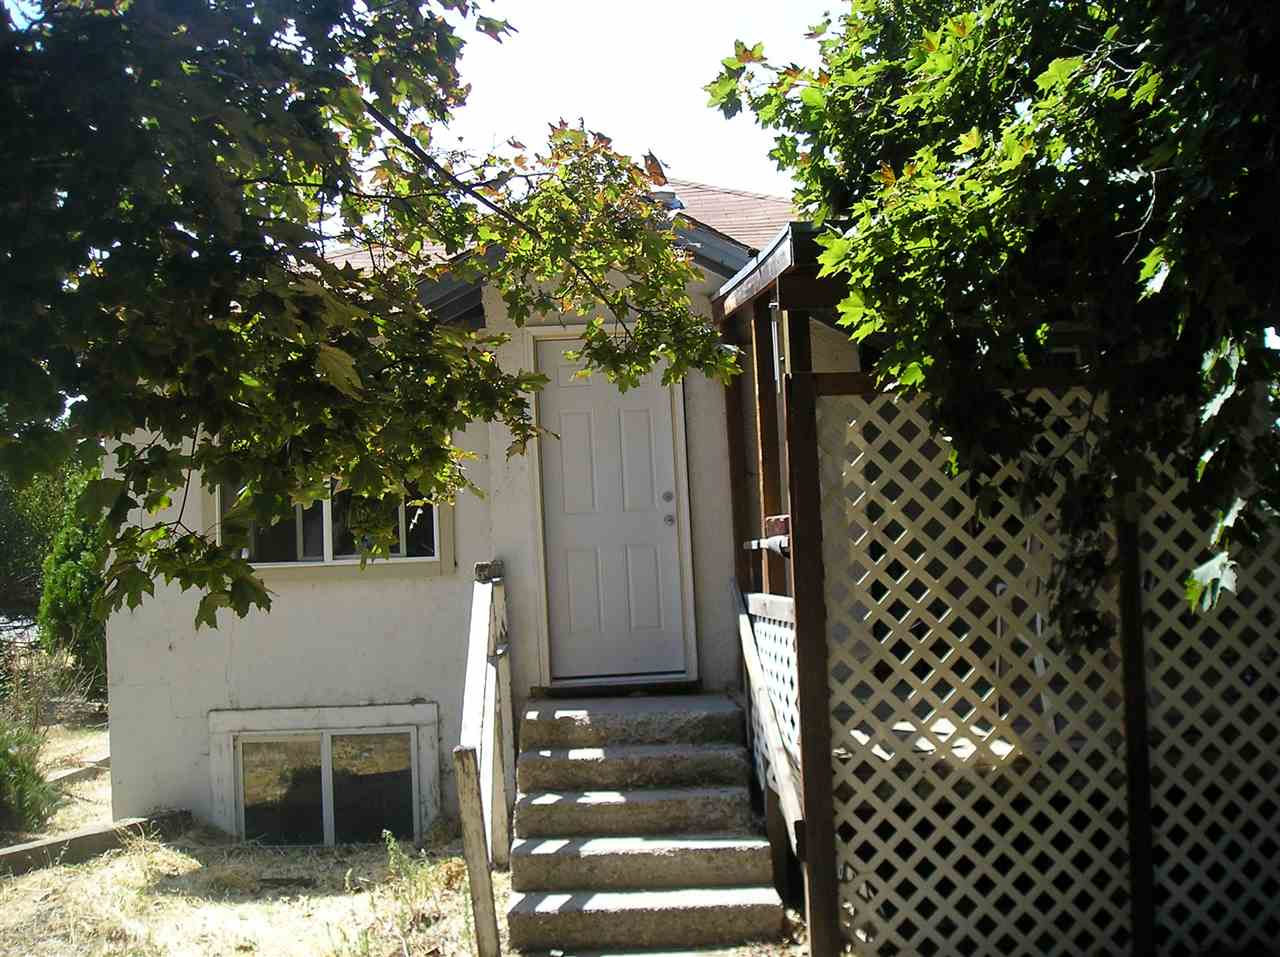 845 Colorado St, Gooding, ID 83330